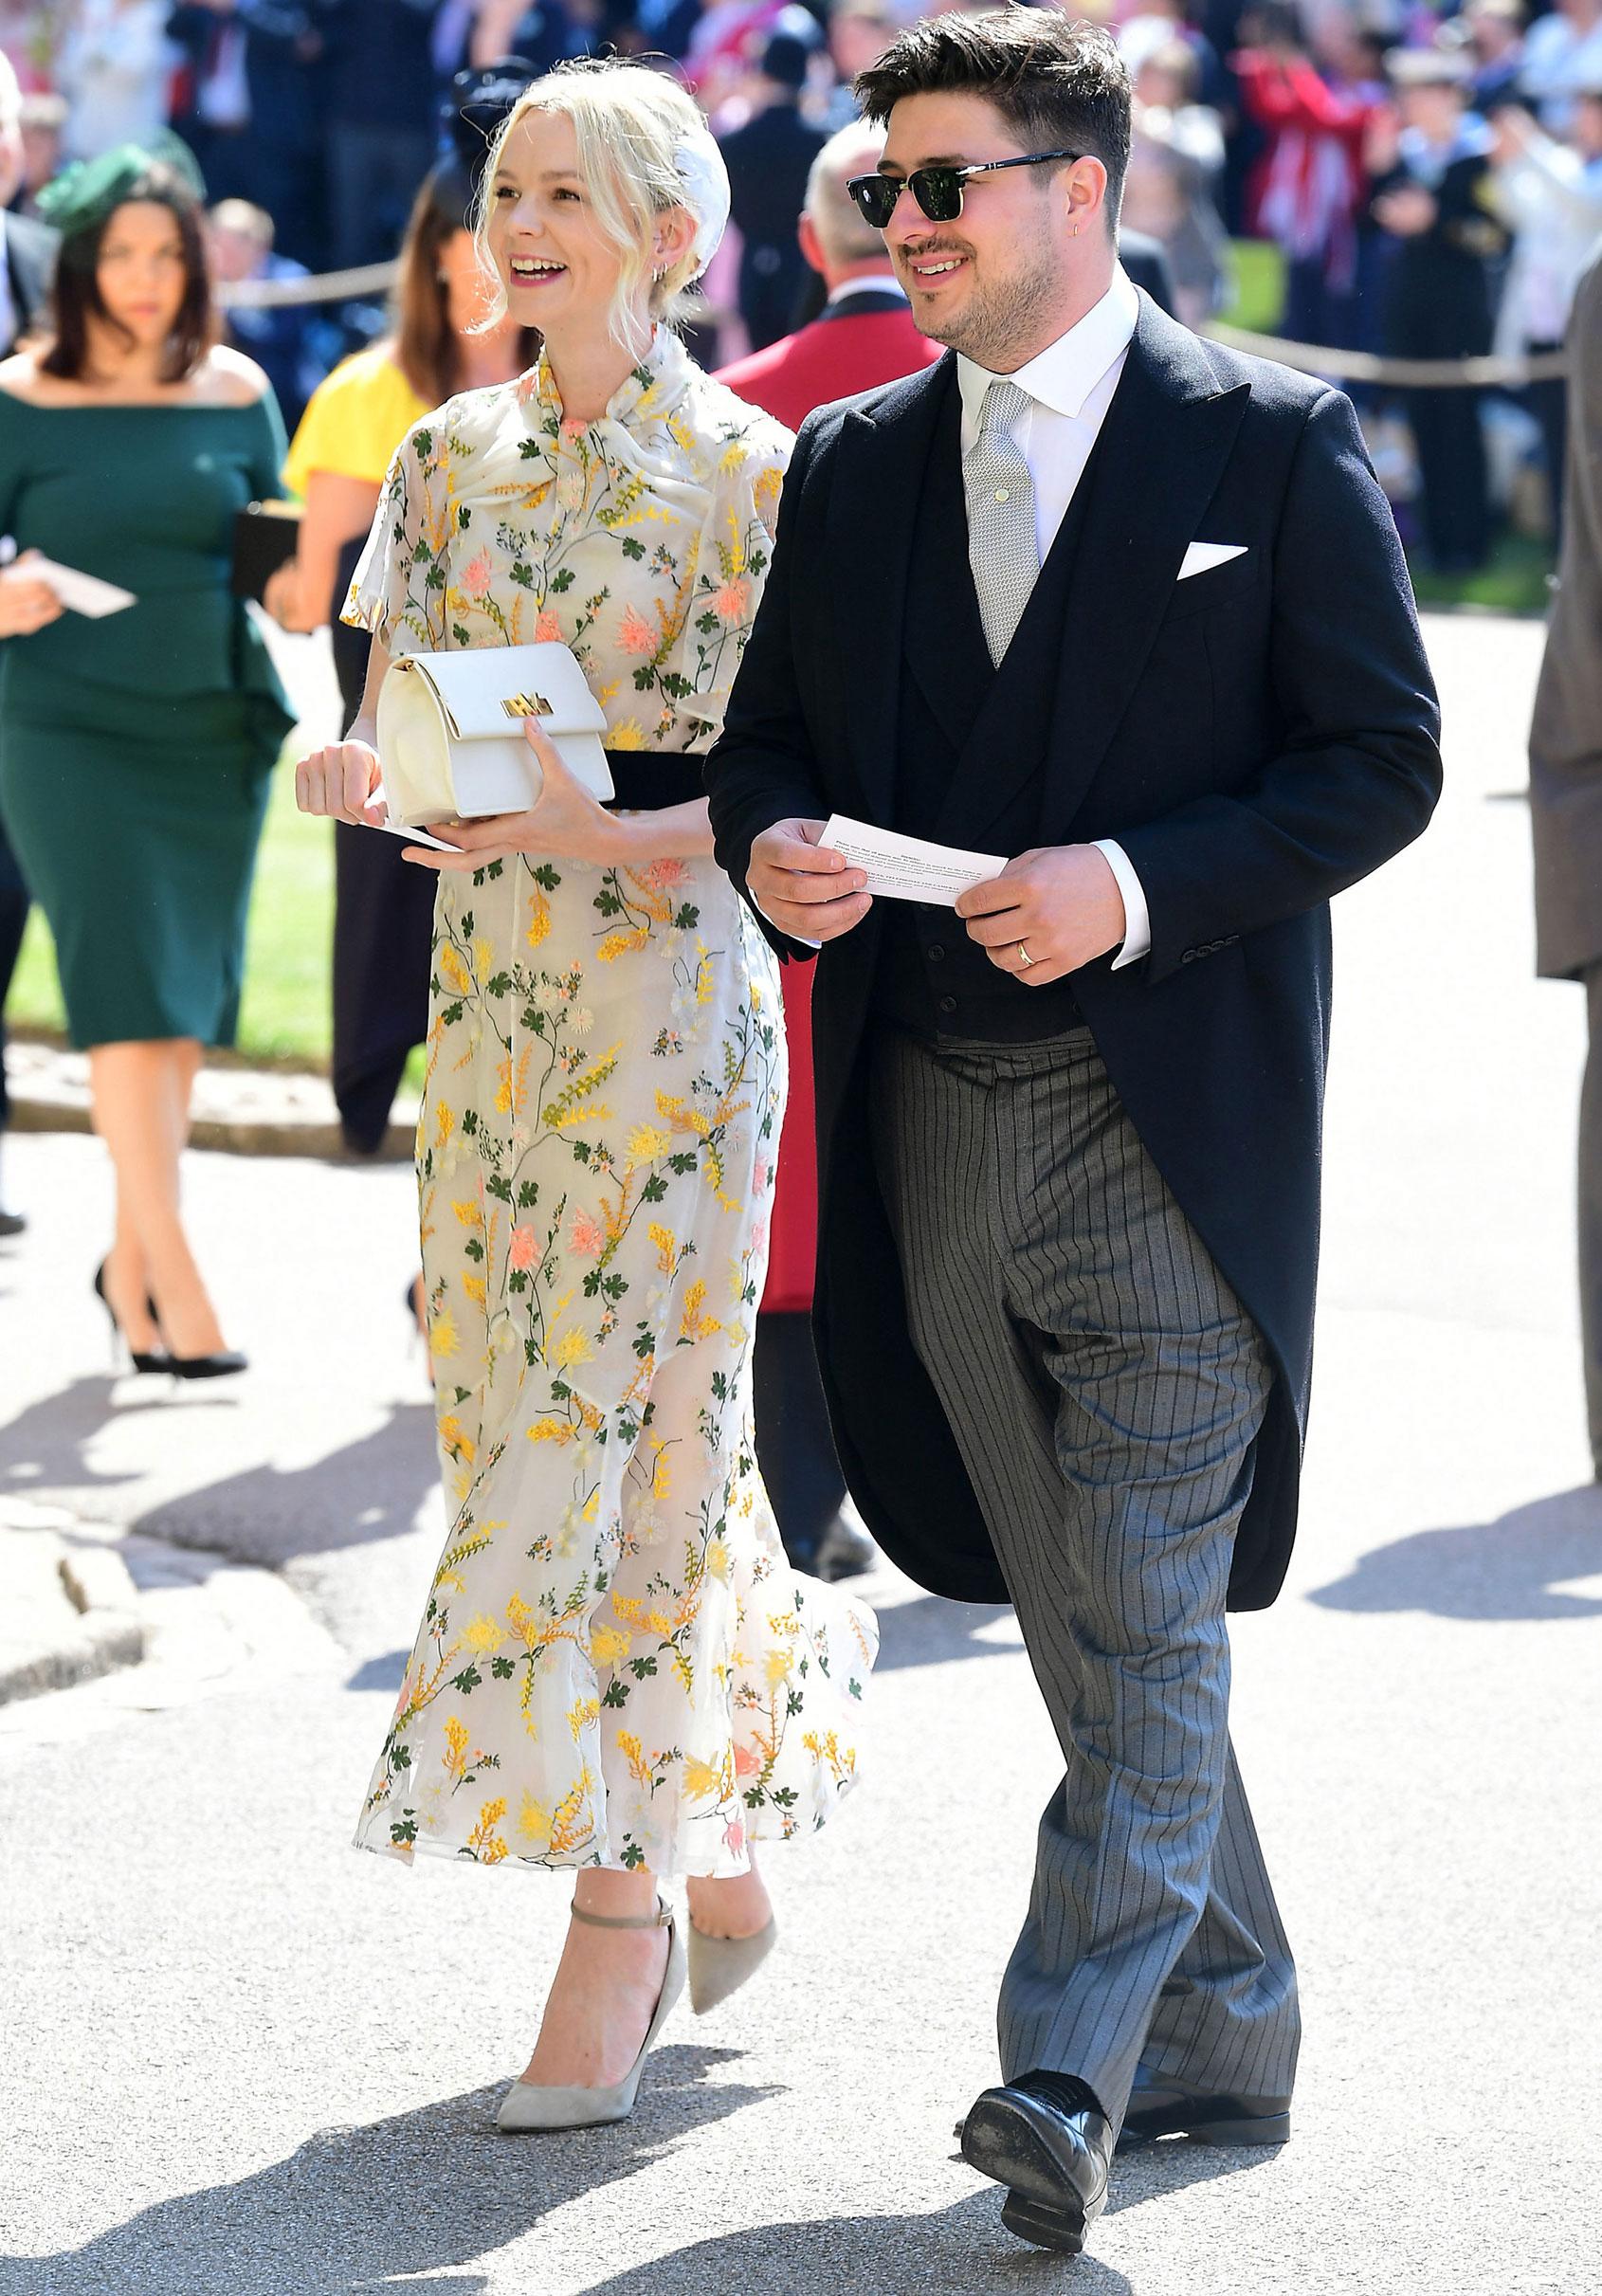 Royal Wedding 2018 Guests.Royal Wedding 2018 Guests Best Dresses Fashion Tips Jones